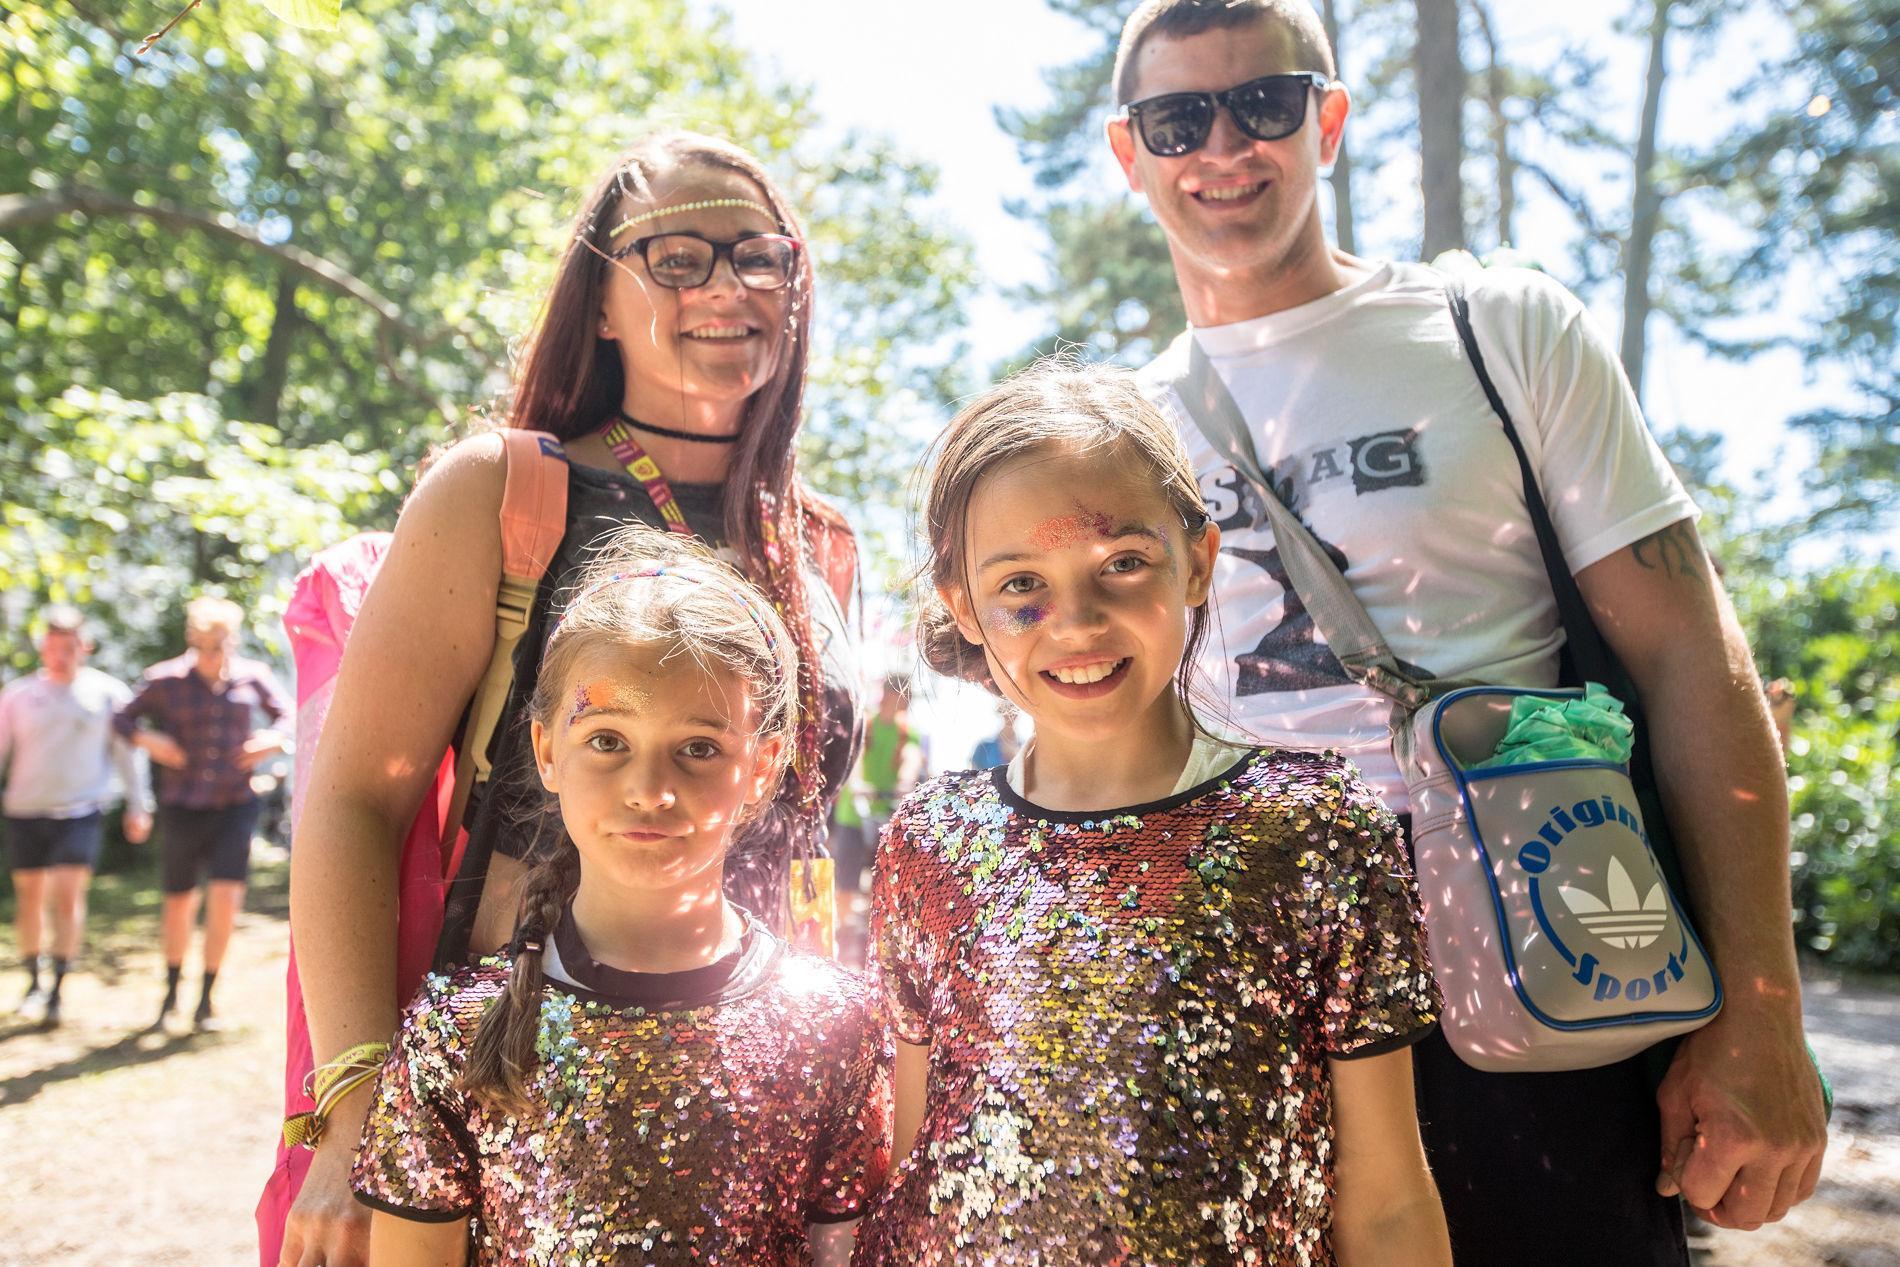 4-CampBestival2017-DisneyRascal-CL-VIC_6621.jpg